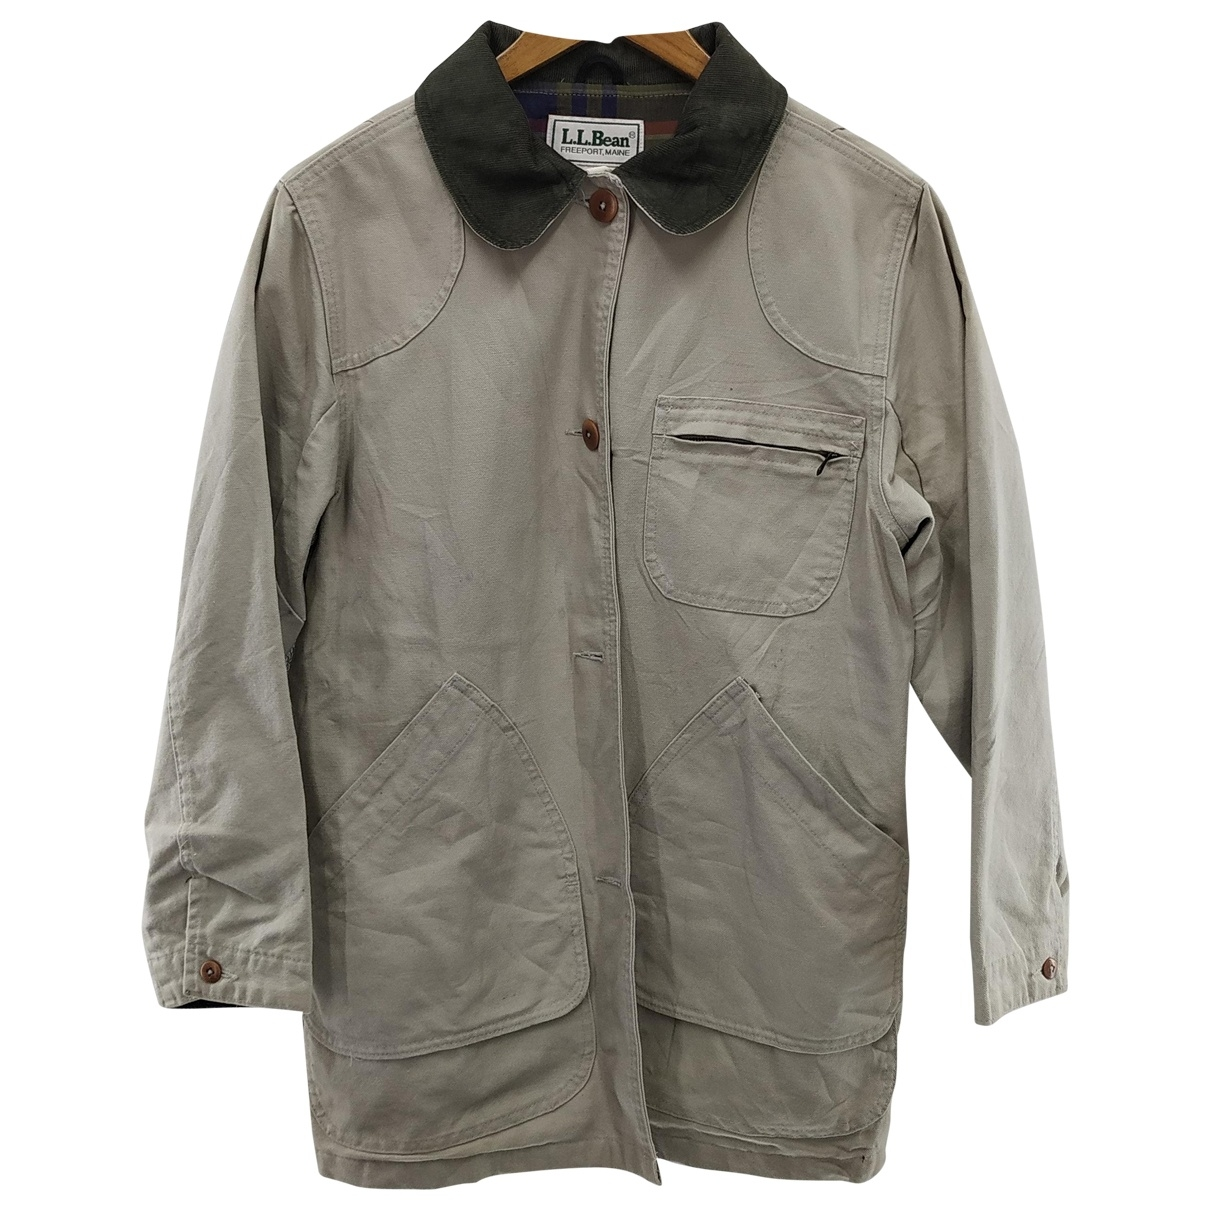 L.l.bean \N Cotton jacket  for Men M International